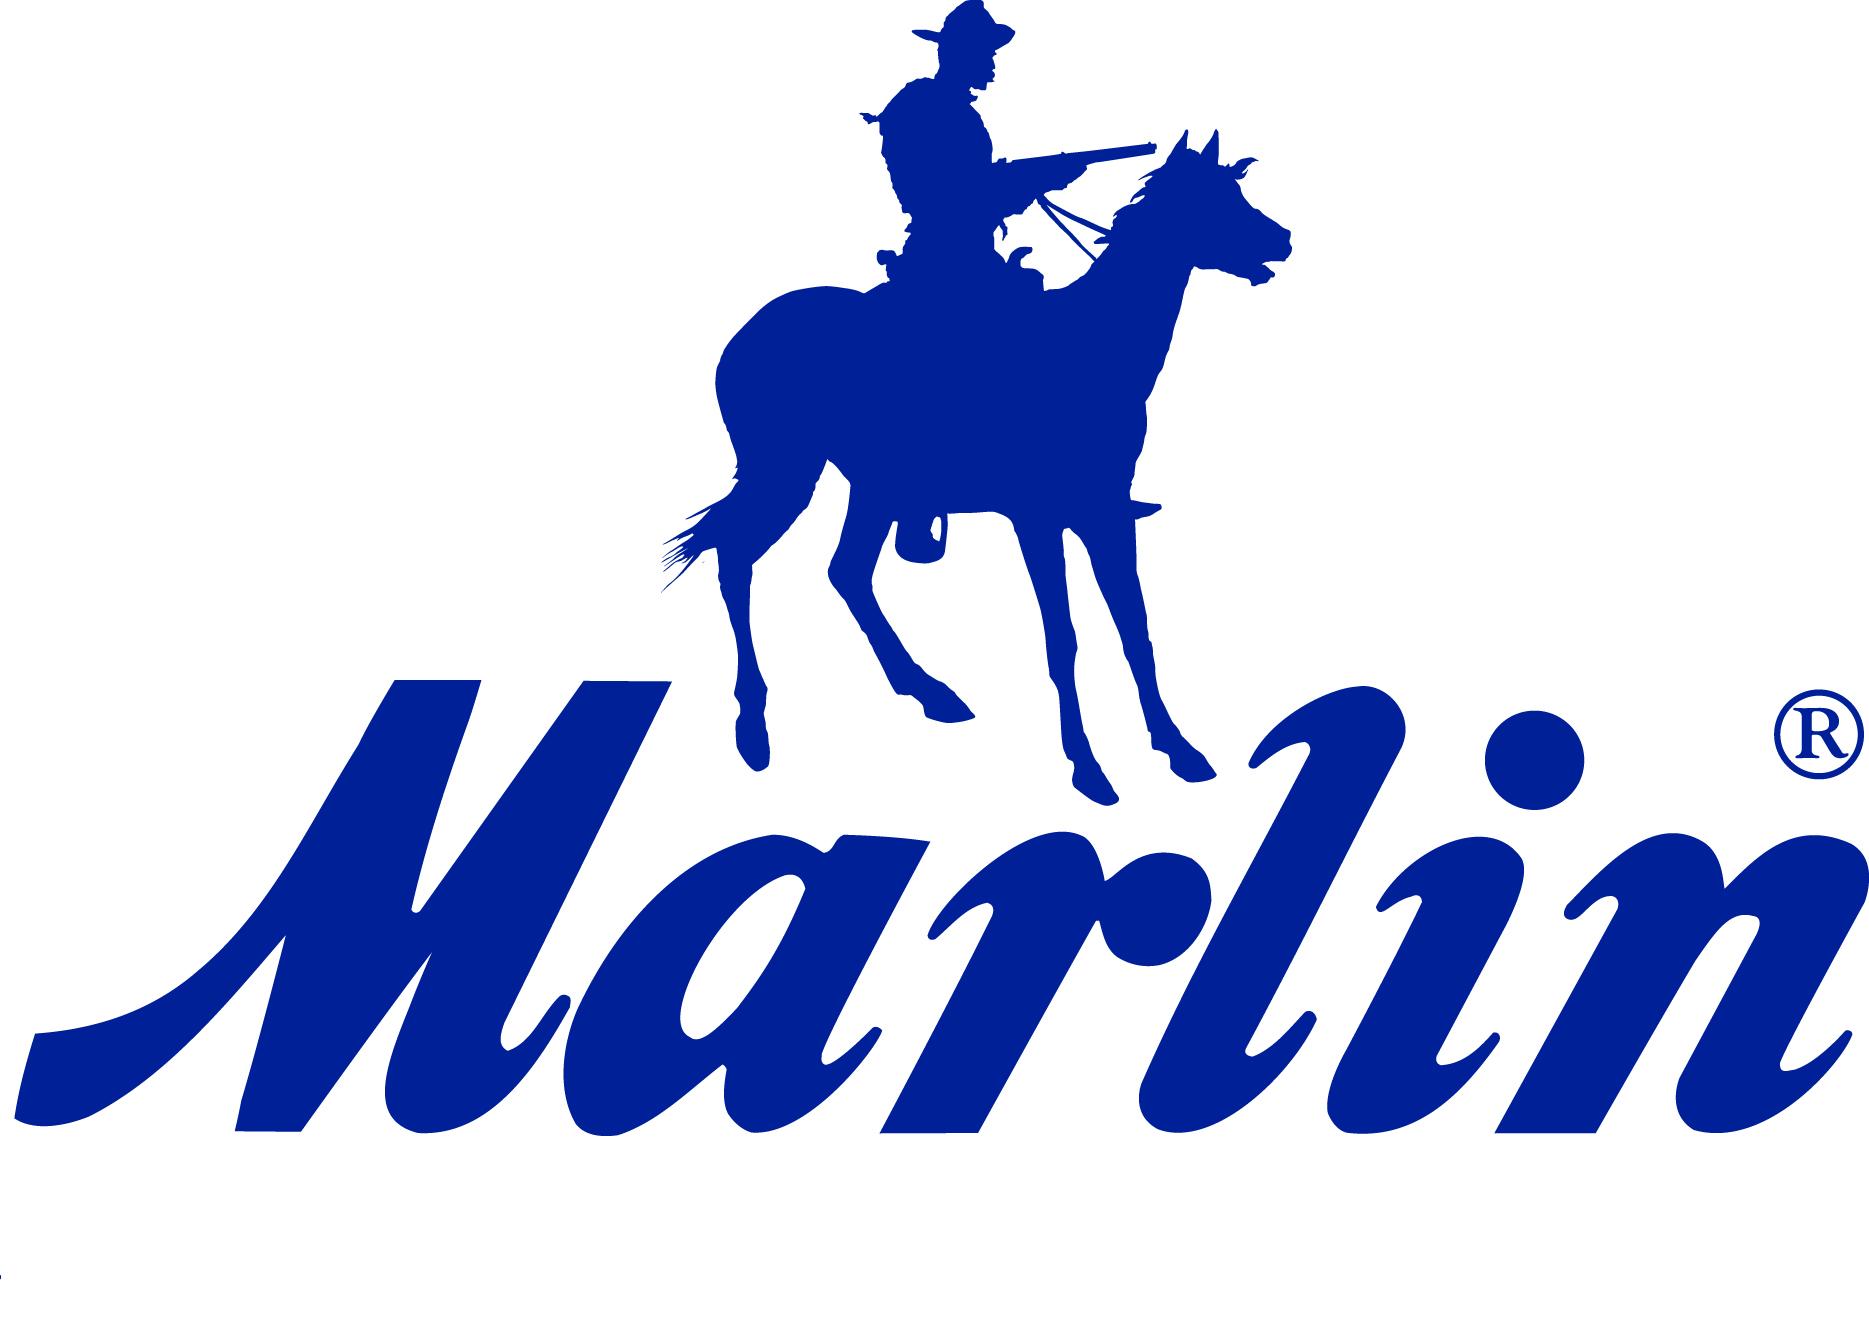 49 Marlin Firearms Wallpaper On Wallpapersafari